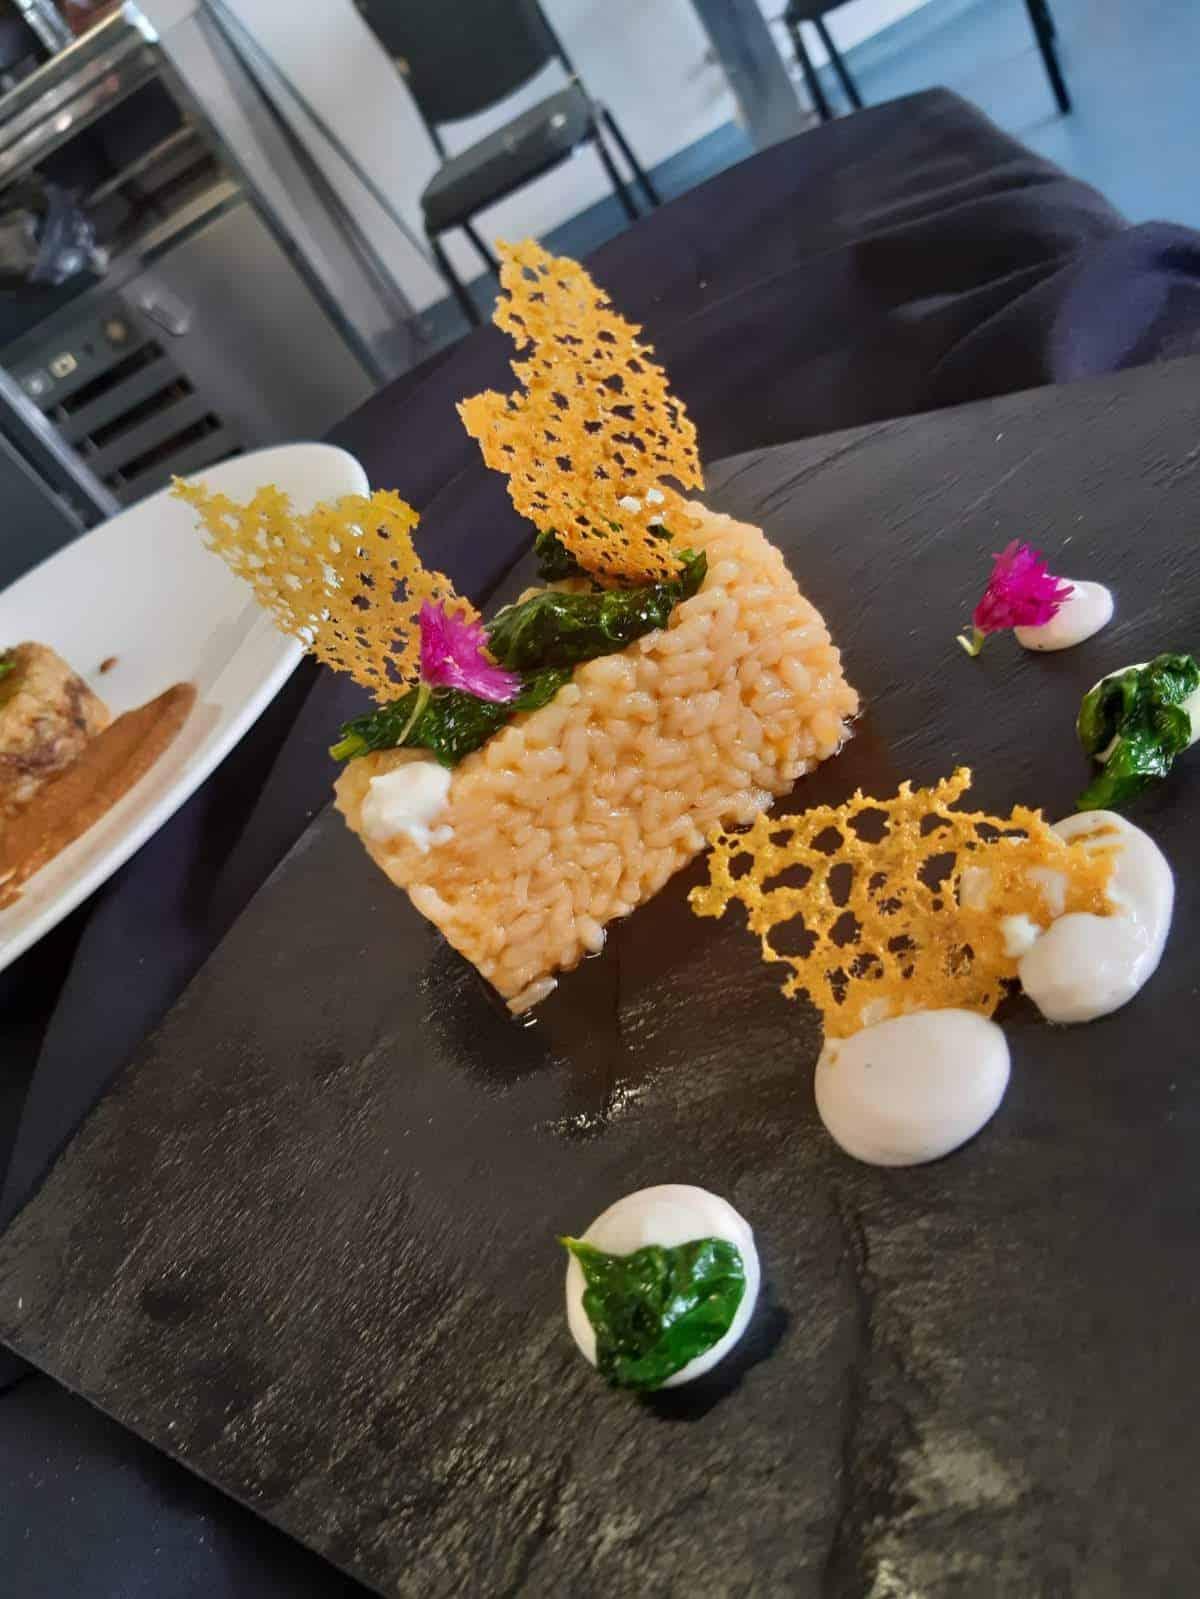 escuela-cocina-villa-retiro-cursos-chef-marianzo-gonzalvo--fran-lopez-estrella-michelin-clases-cultura-gastromica